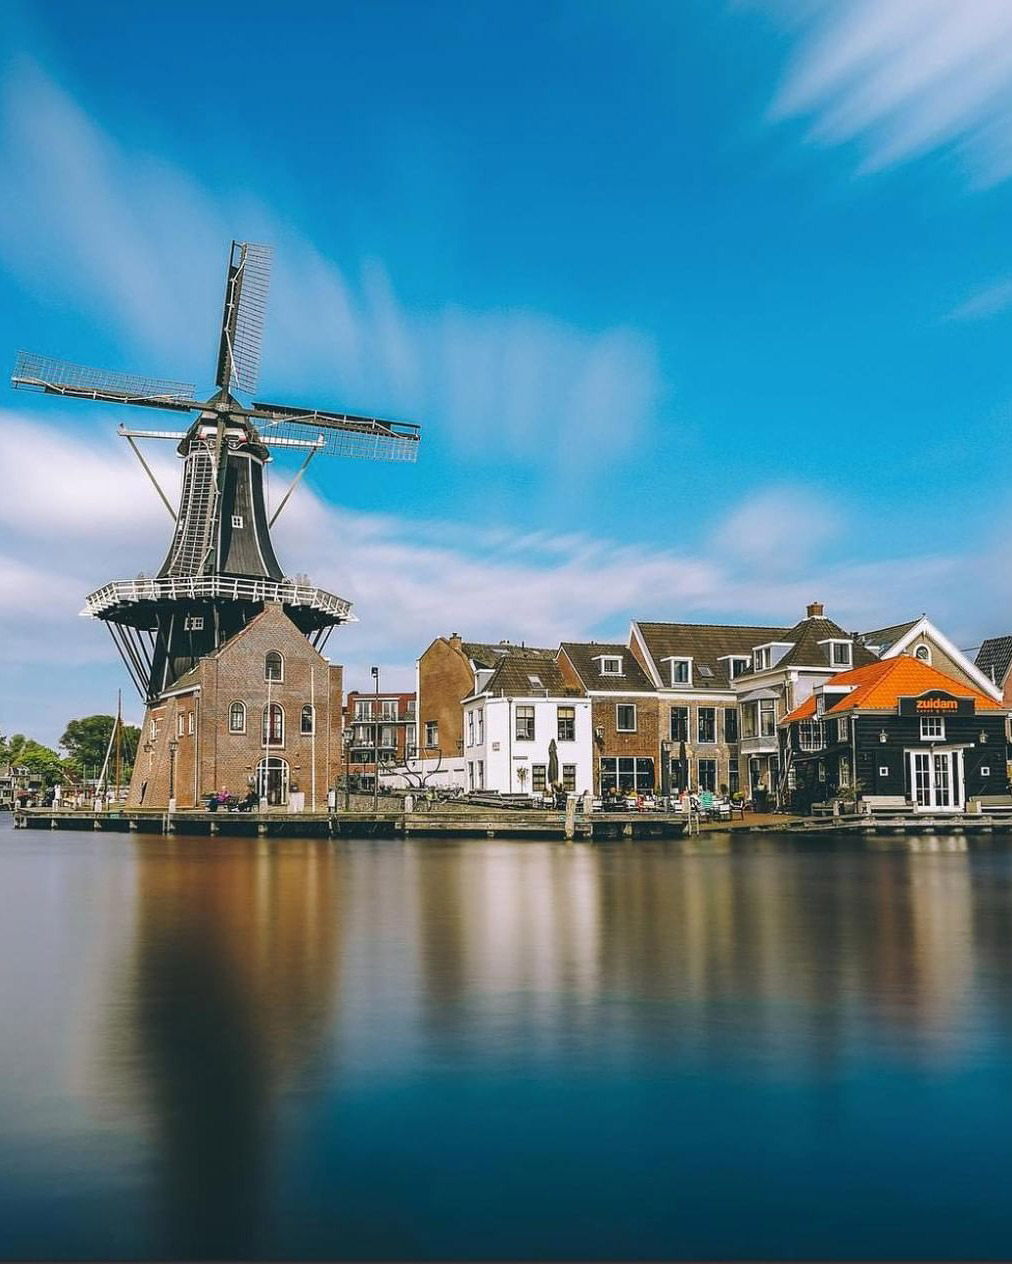 Welkom terug in Nederland.